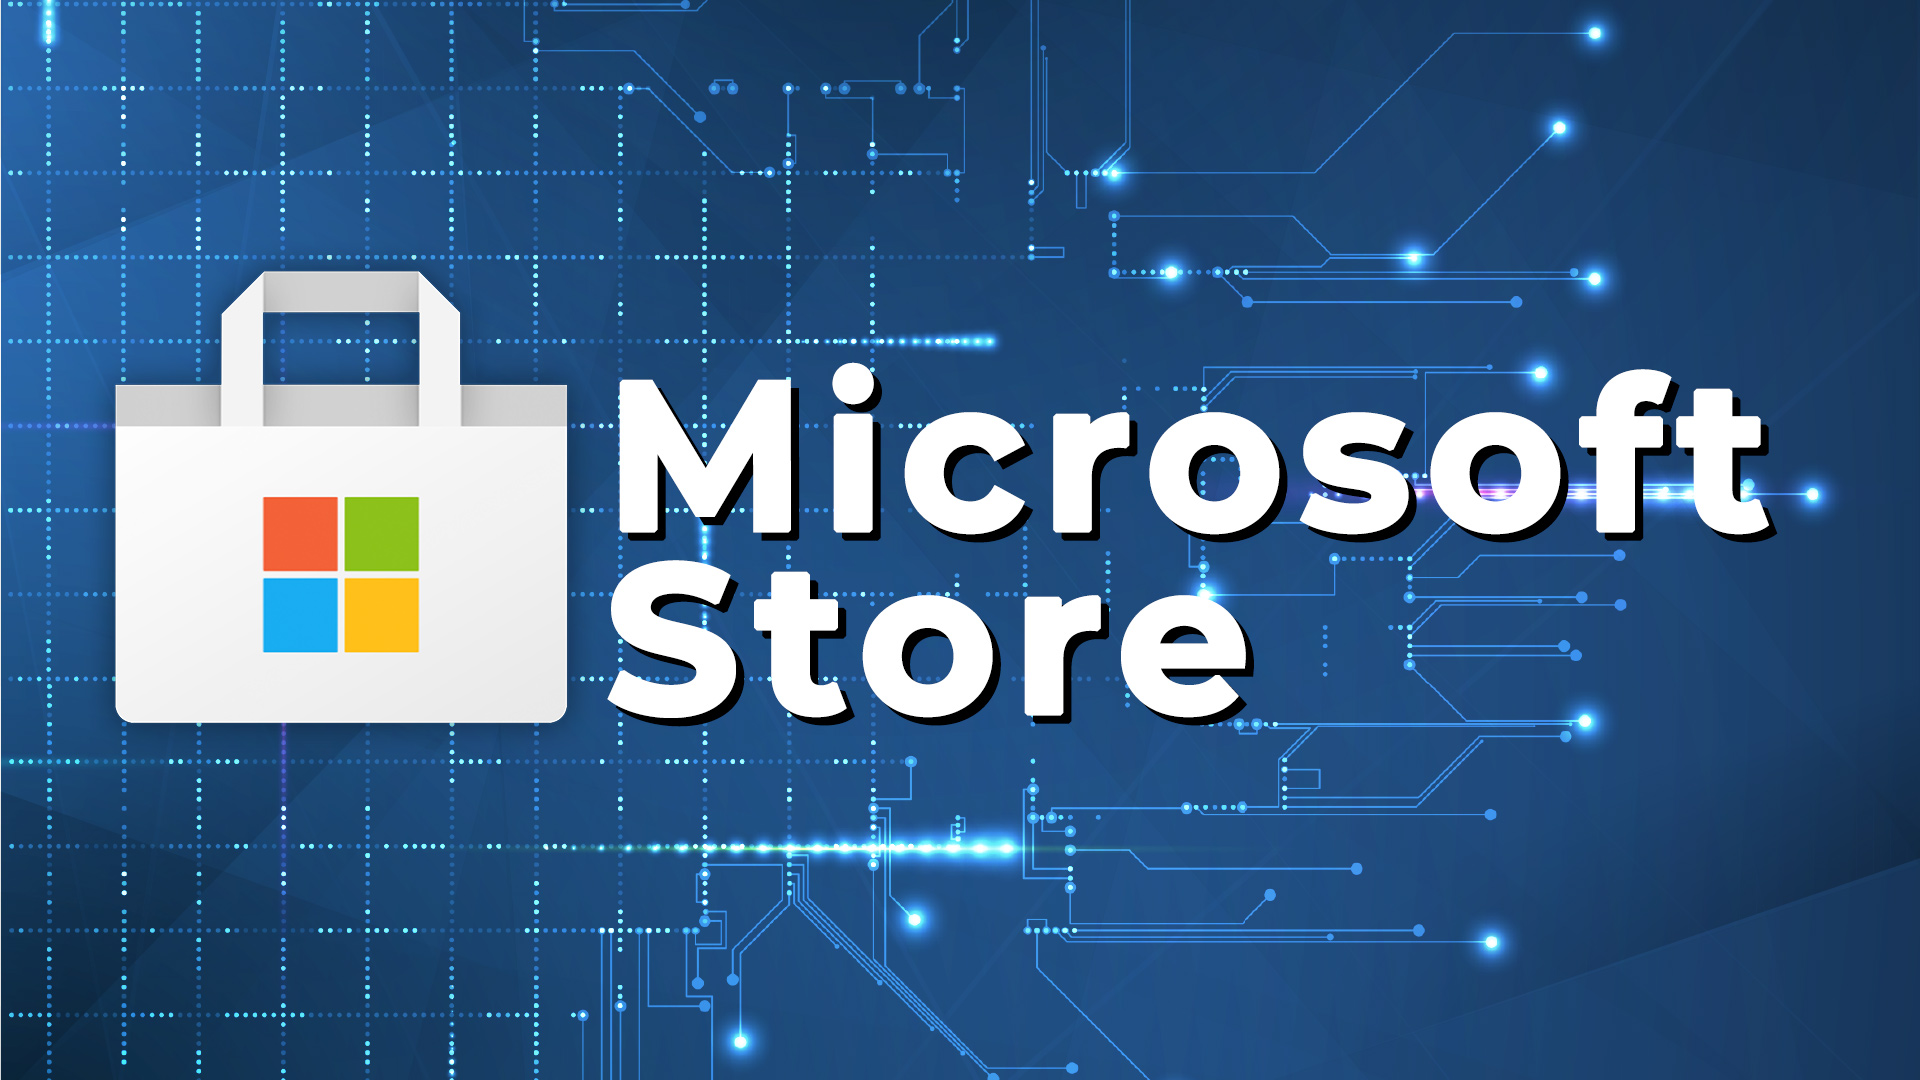 App Store, Windows Store, Microsoft Store